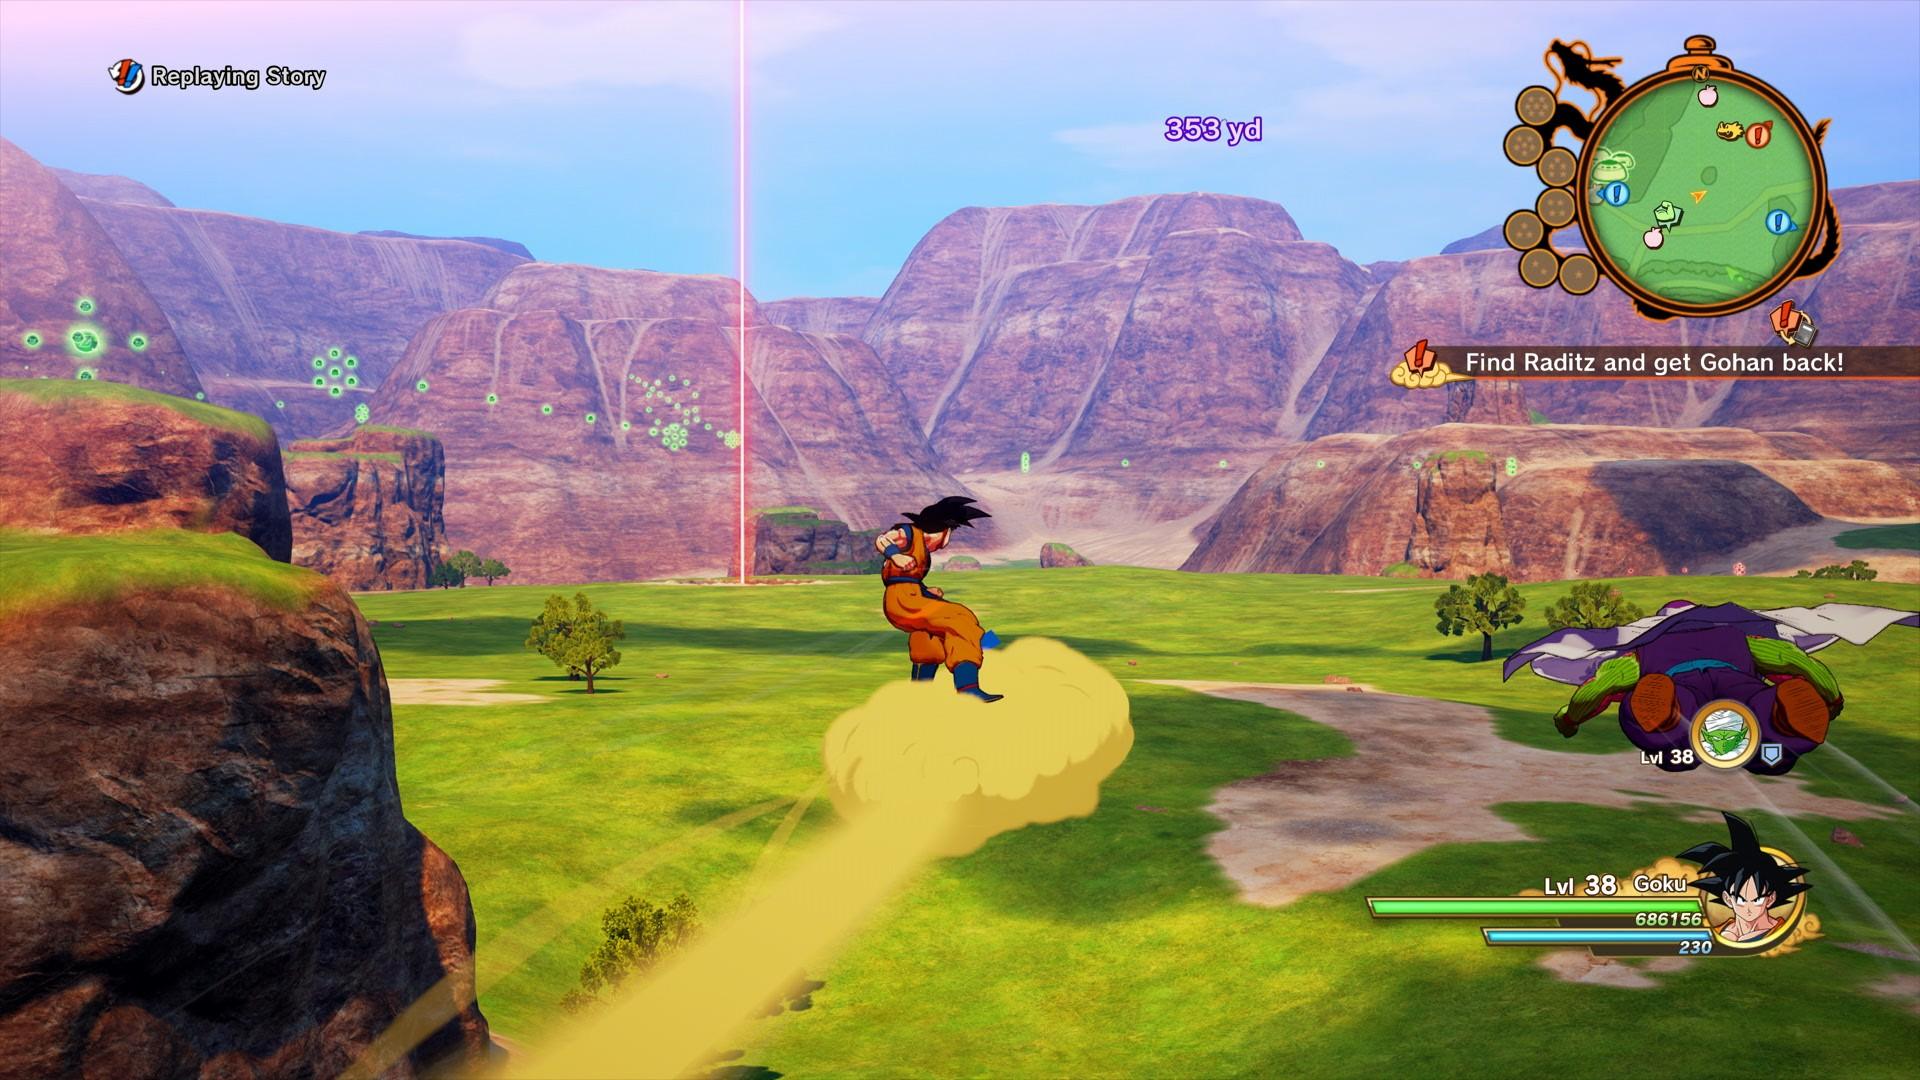 Dragon Ball Z: Kakarot's mission-hopping time machine mechanic arrives today as an update screenshot